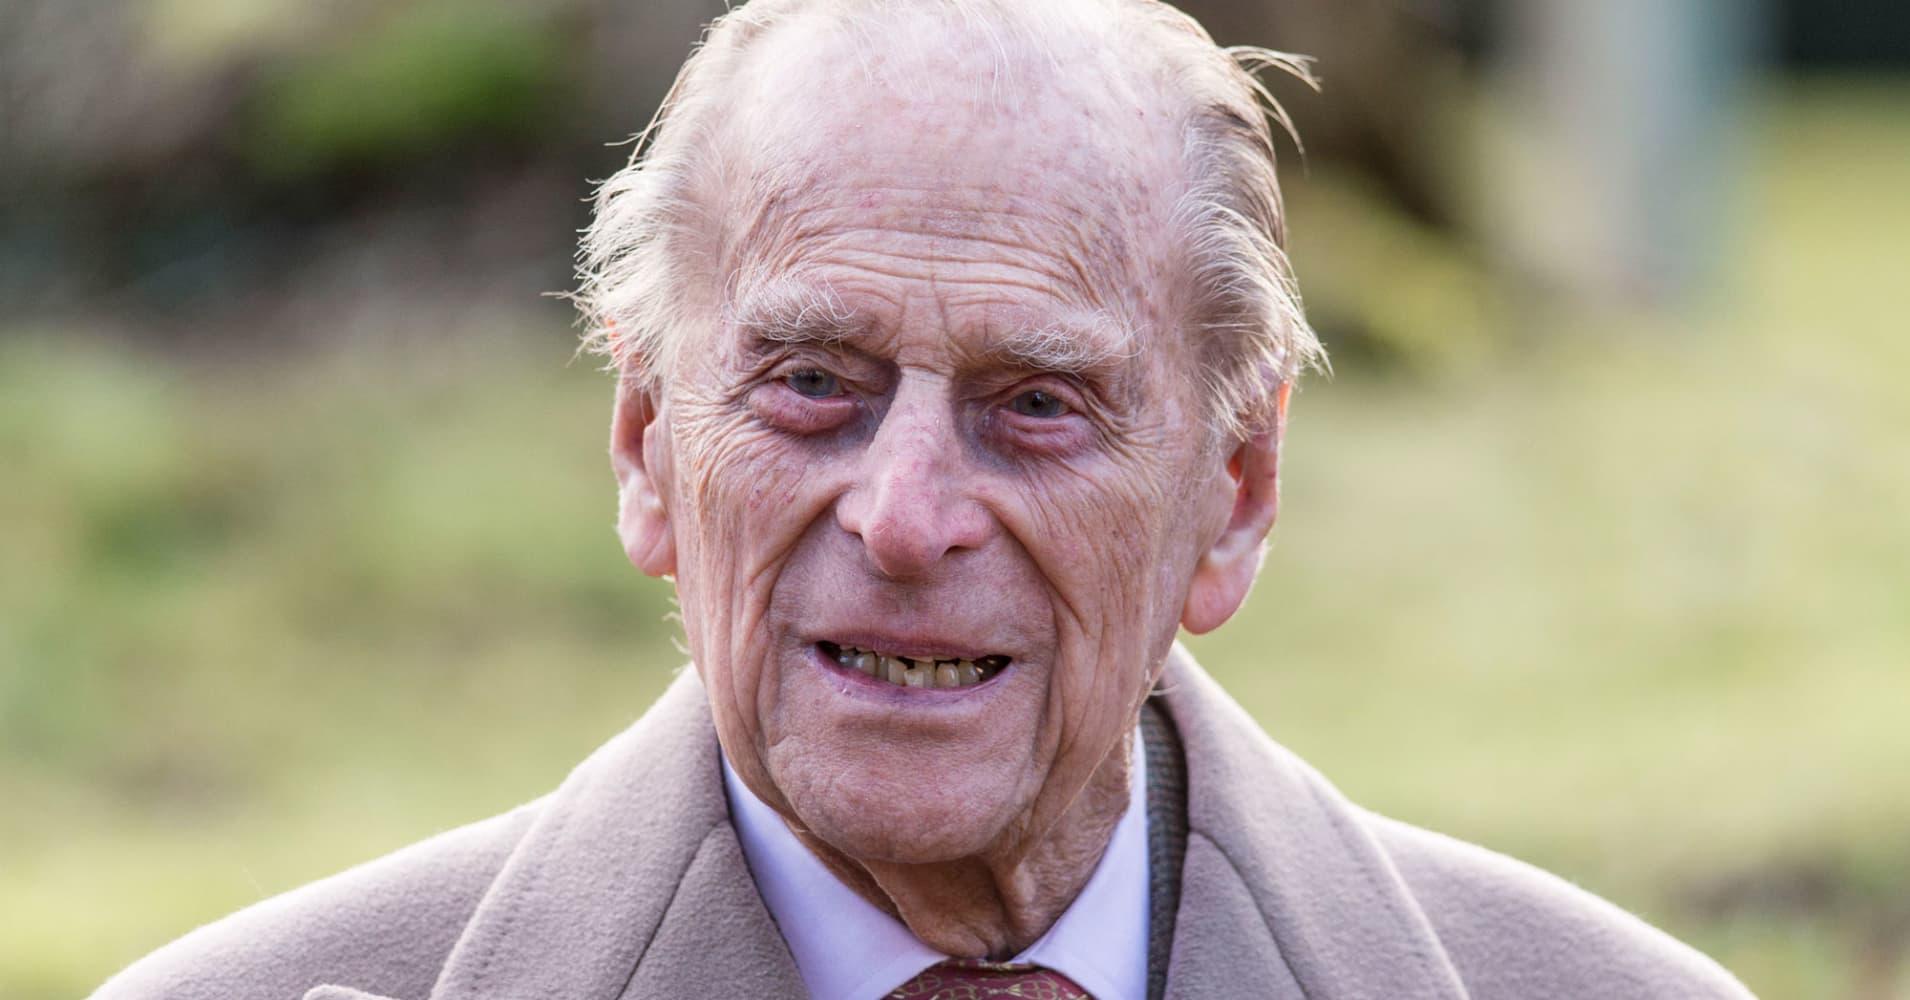 Prince Philip, 97, gives up driver's license after crash